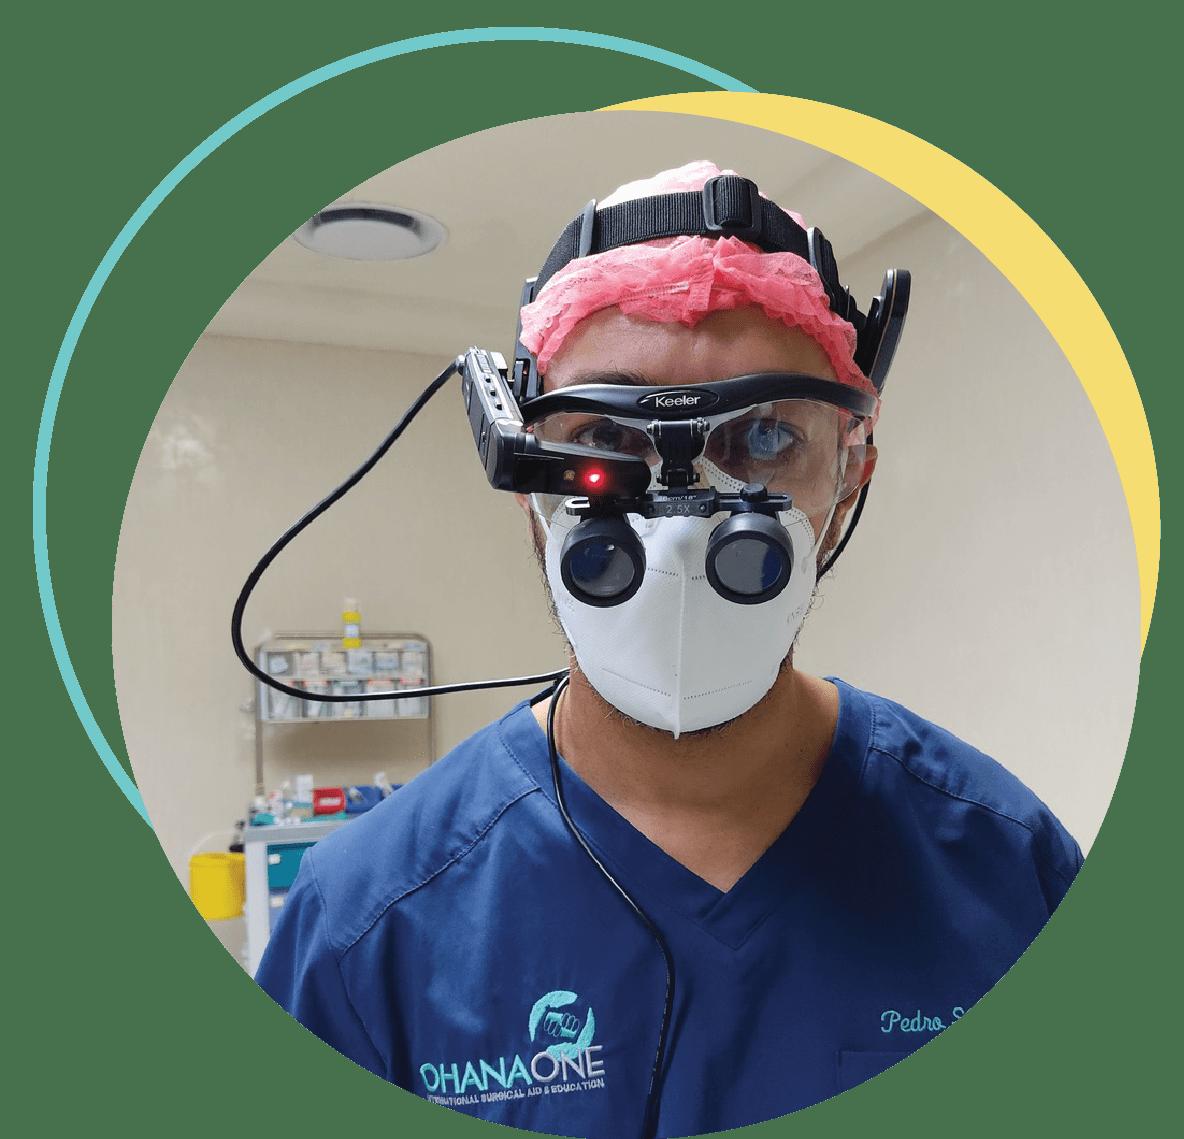 Dr. Pedro Santos wearing Vuzix Smart Glasses